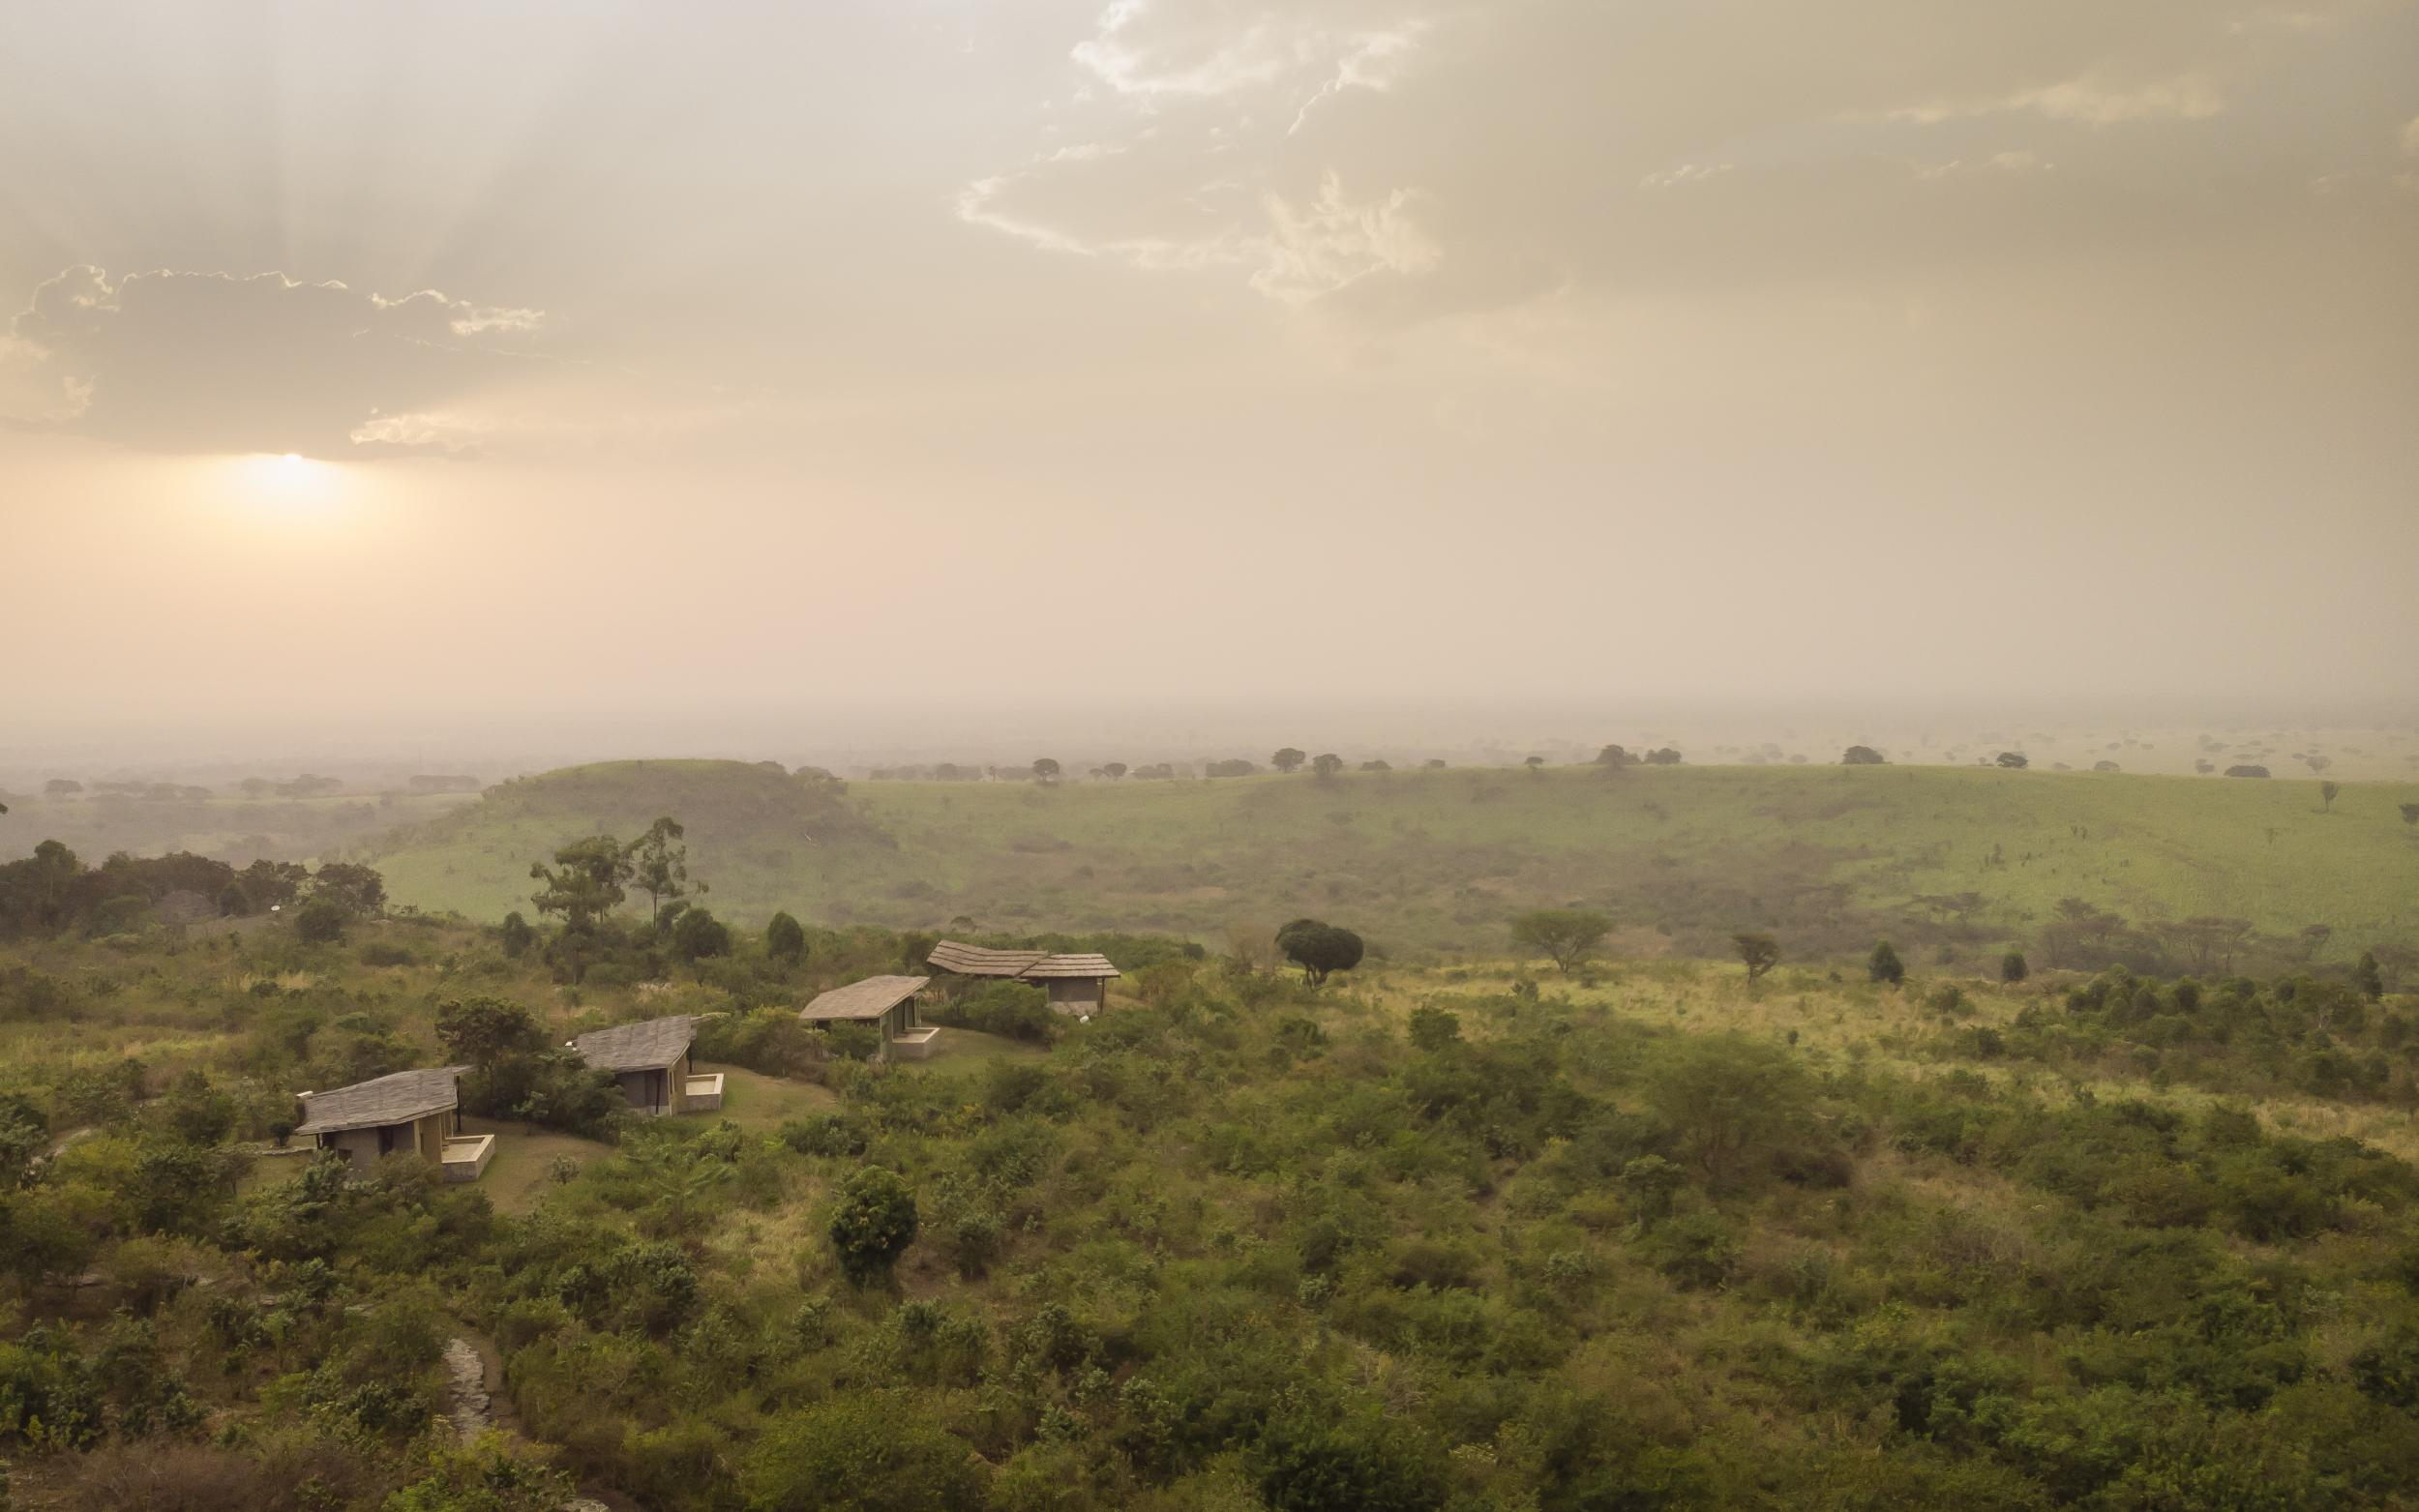 10 reasons to visit Uganda: From golden monkeys to gorillas